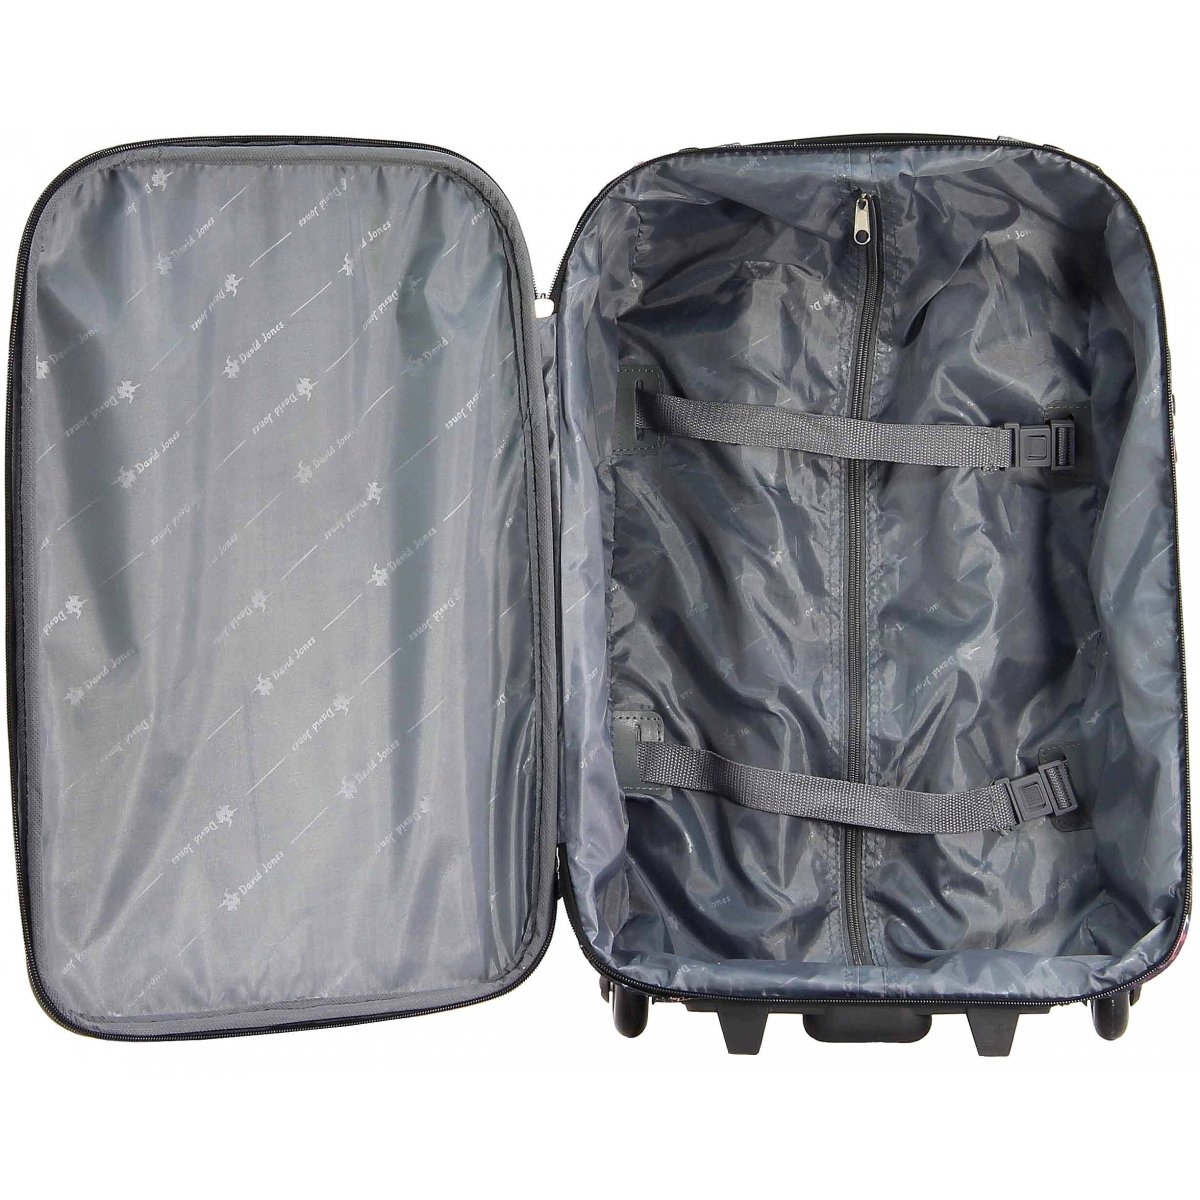 Valise cabine ryanair et reporter david jones ba10082 couleur principale - Valise a prix discount ...